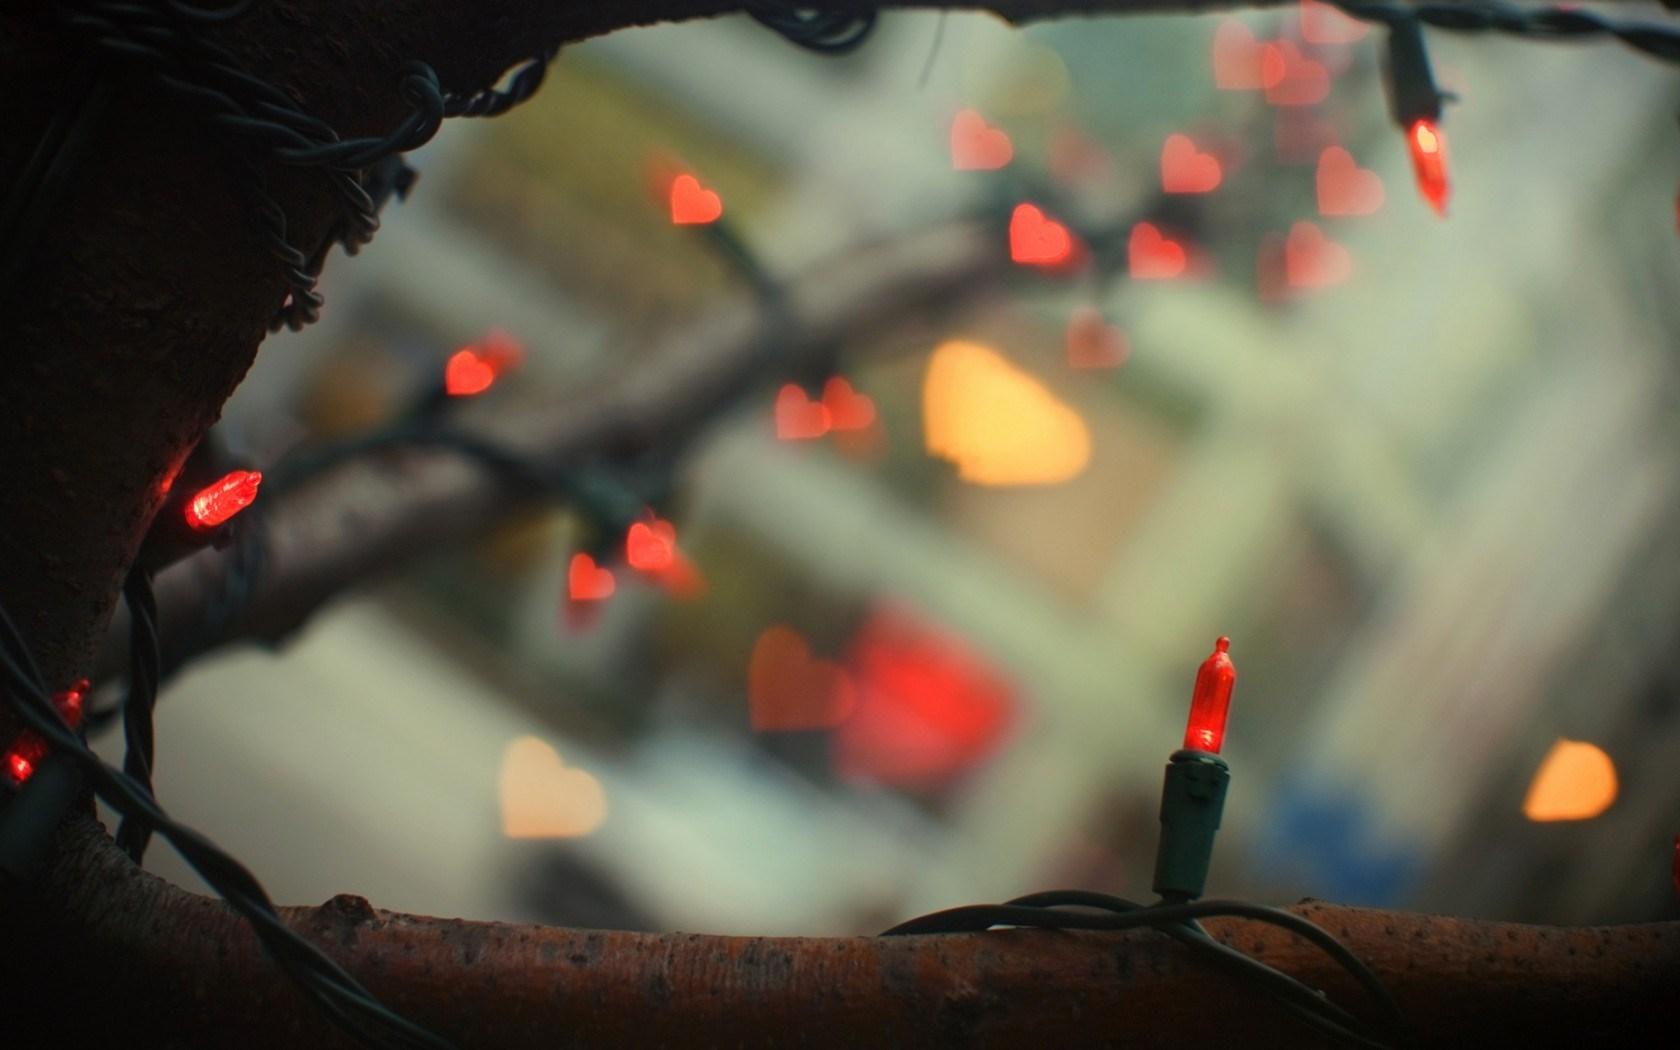 Christmas Garland Lights Hearts Bokeh Tree Branches Winter New Year